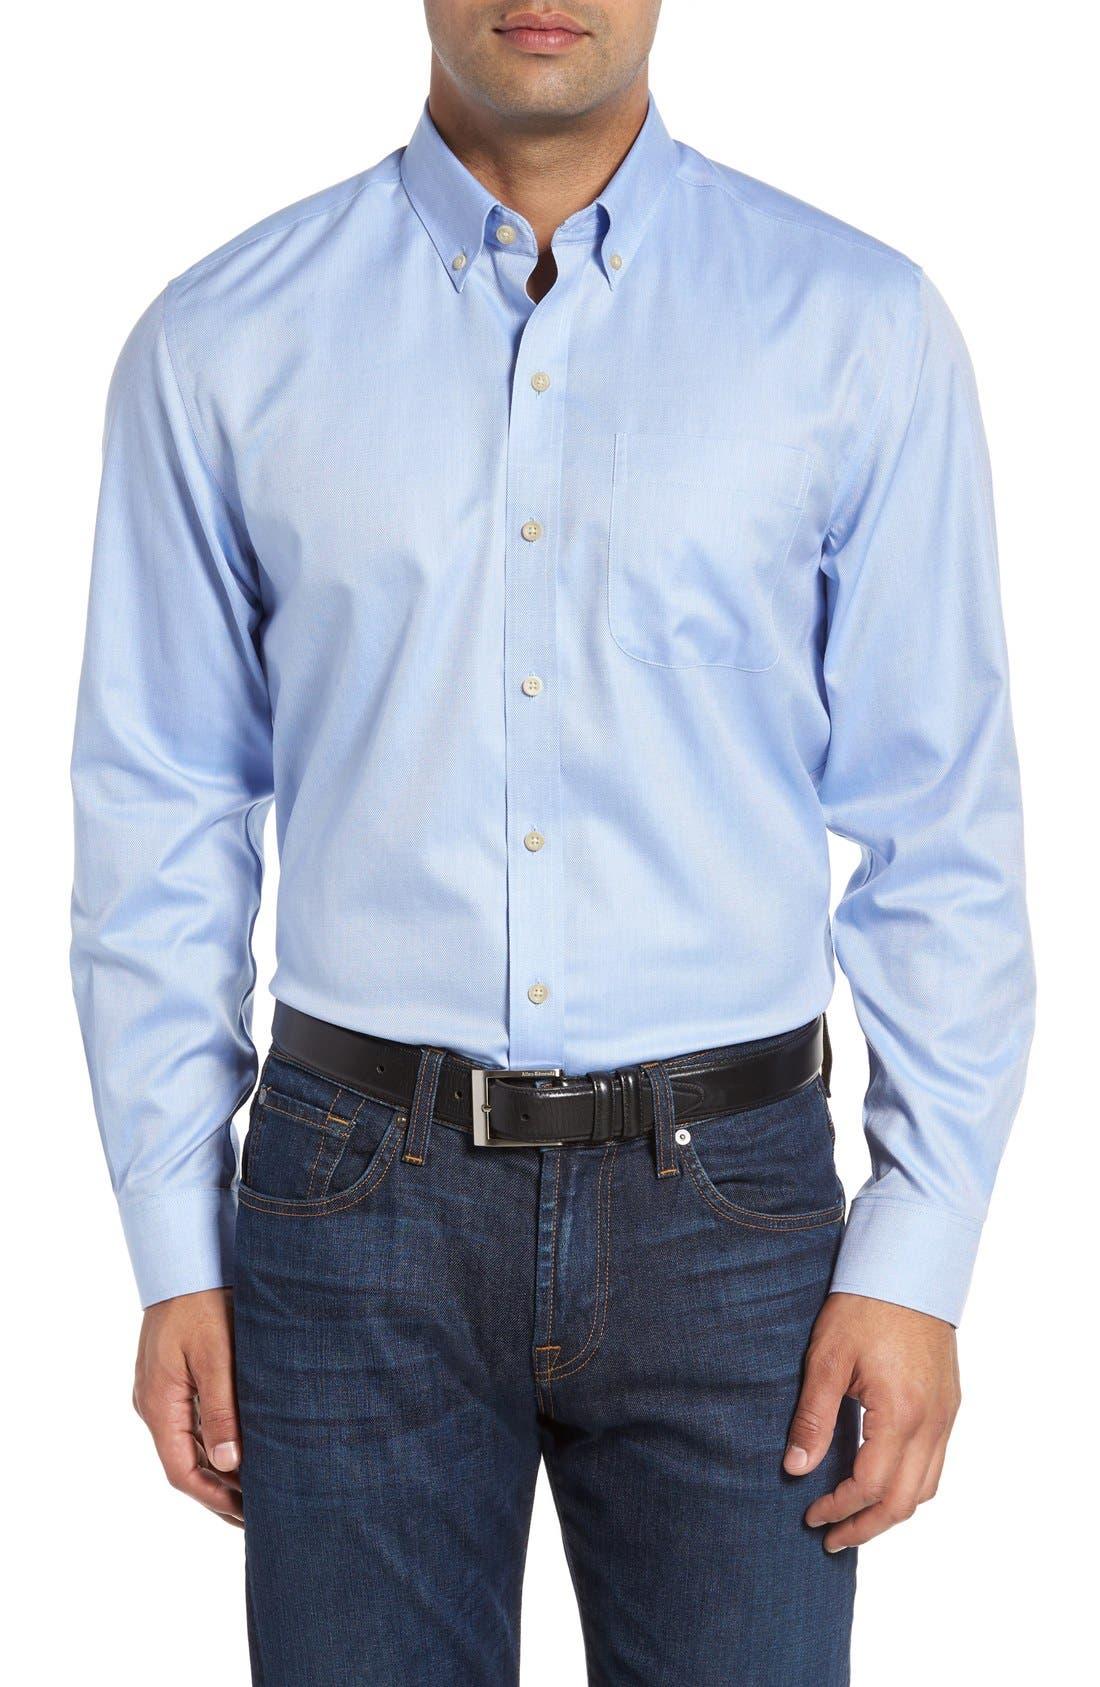 San Juan Classic Fit Wrinkle Free Solid Sport Shirt,                             Main thumbnail 1, color,                             Blue